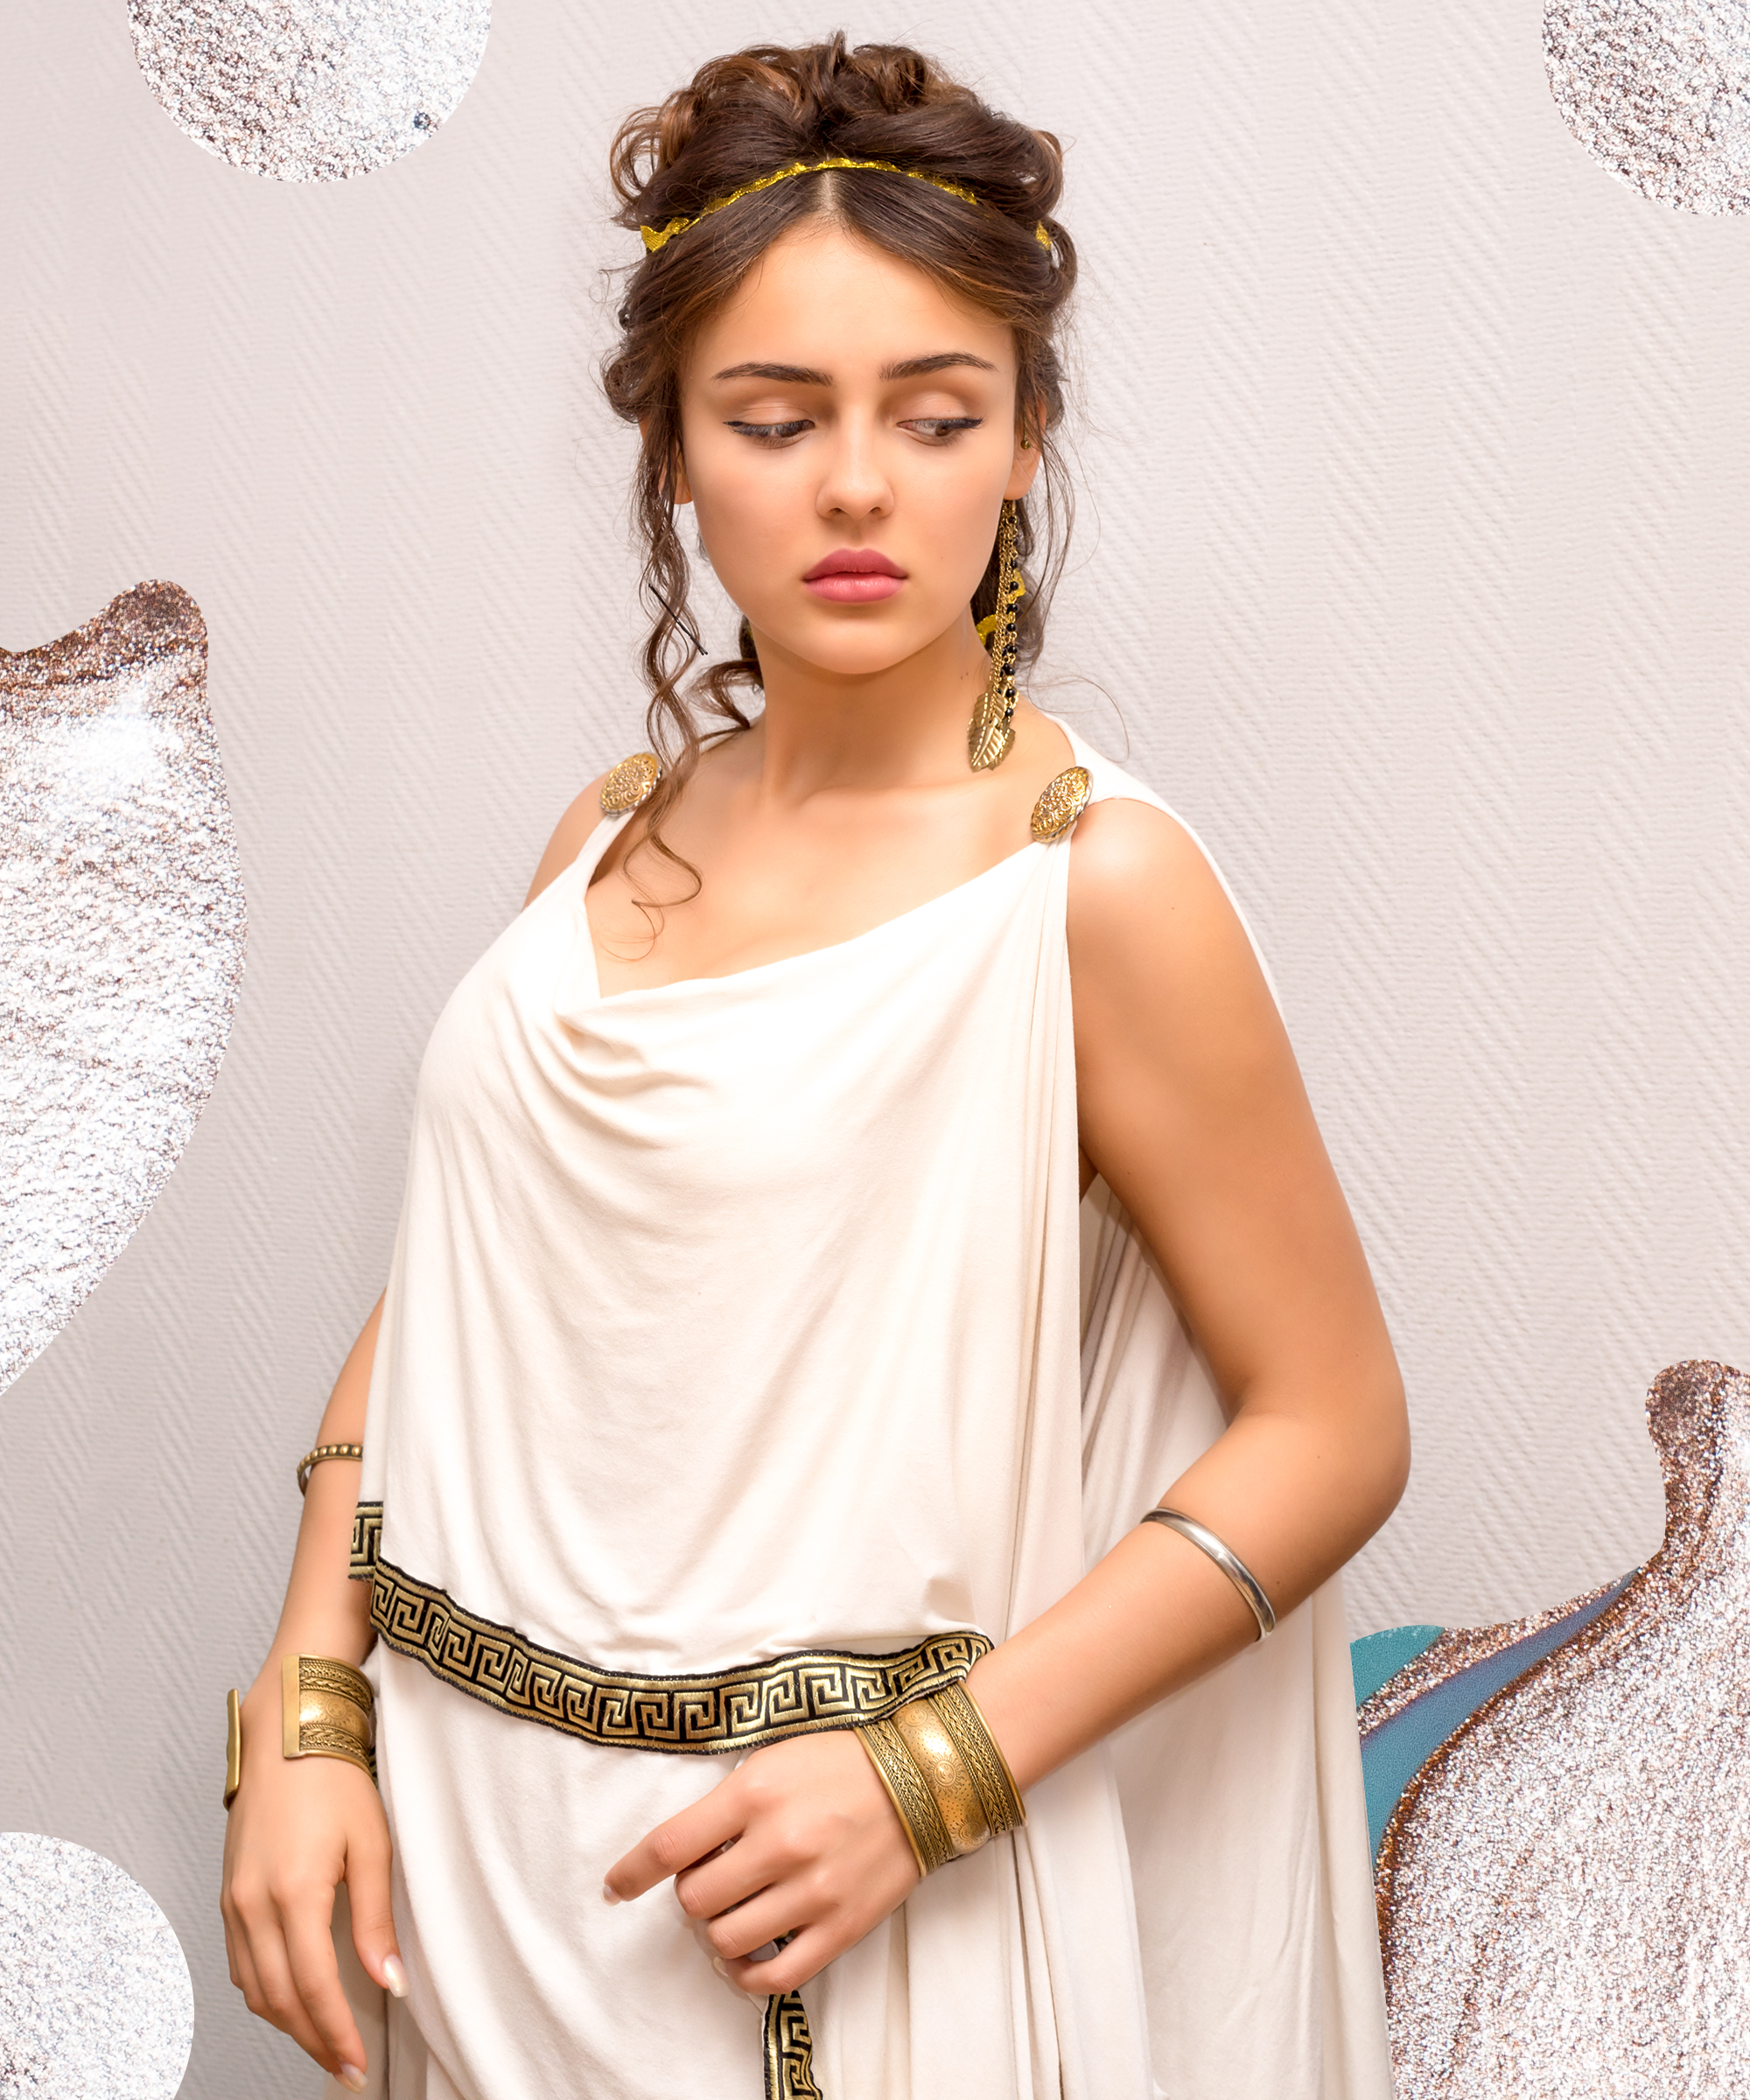 Greek Goddess \u0026 Mythology Halloween Costume Ideas 2018